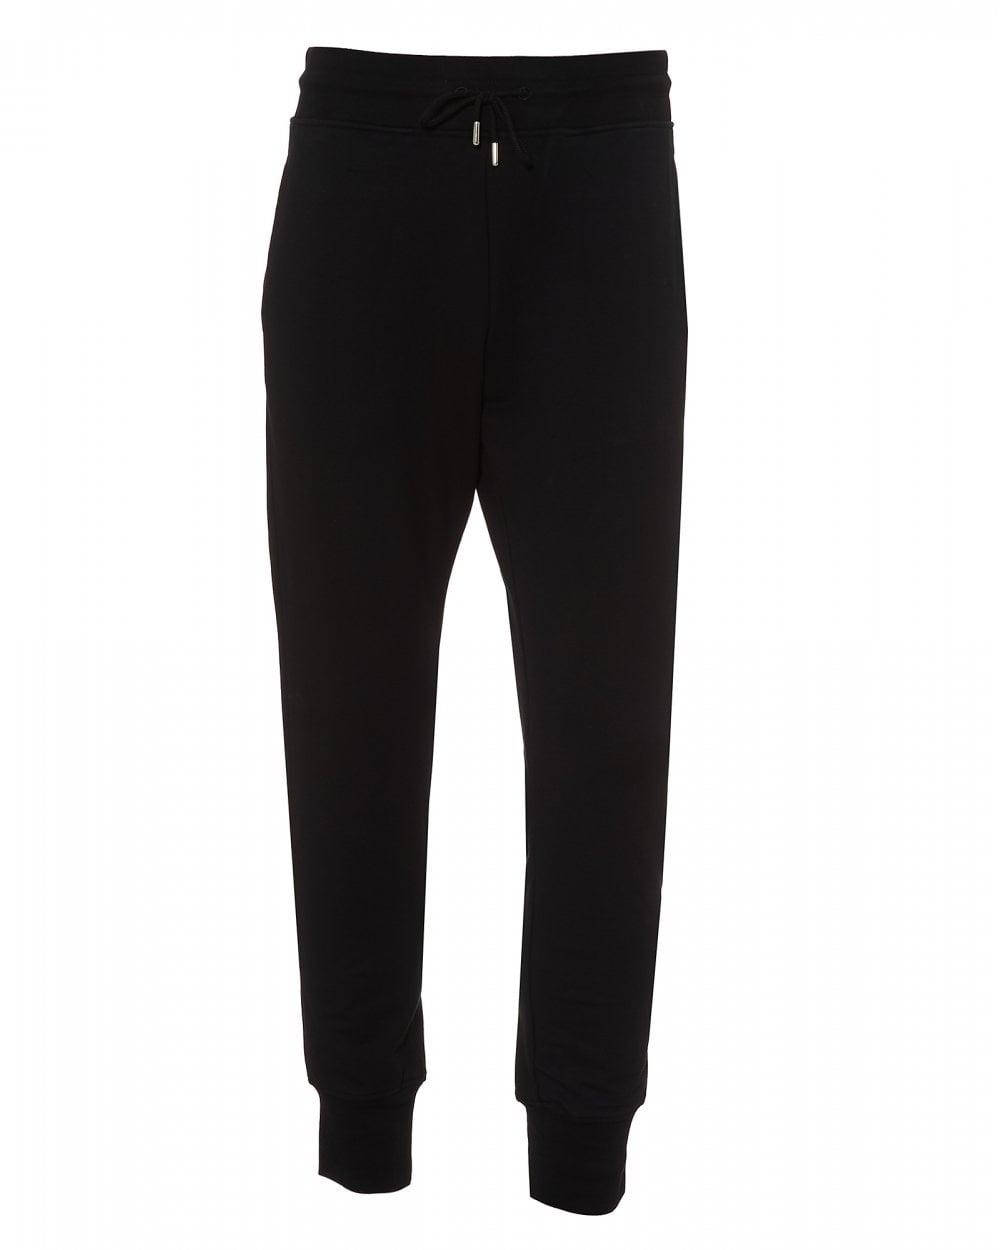 470fbe114d Love Moschino Mens Cuffed Track Pants, Black Slim Fit Sweat Pants